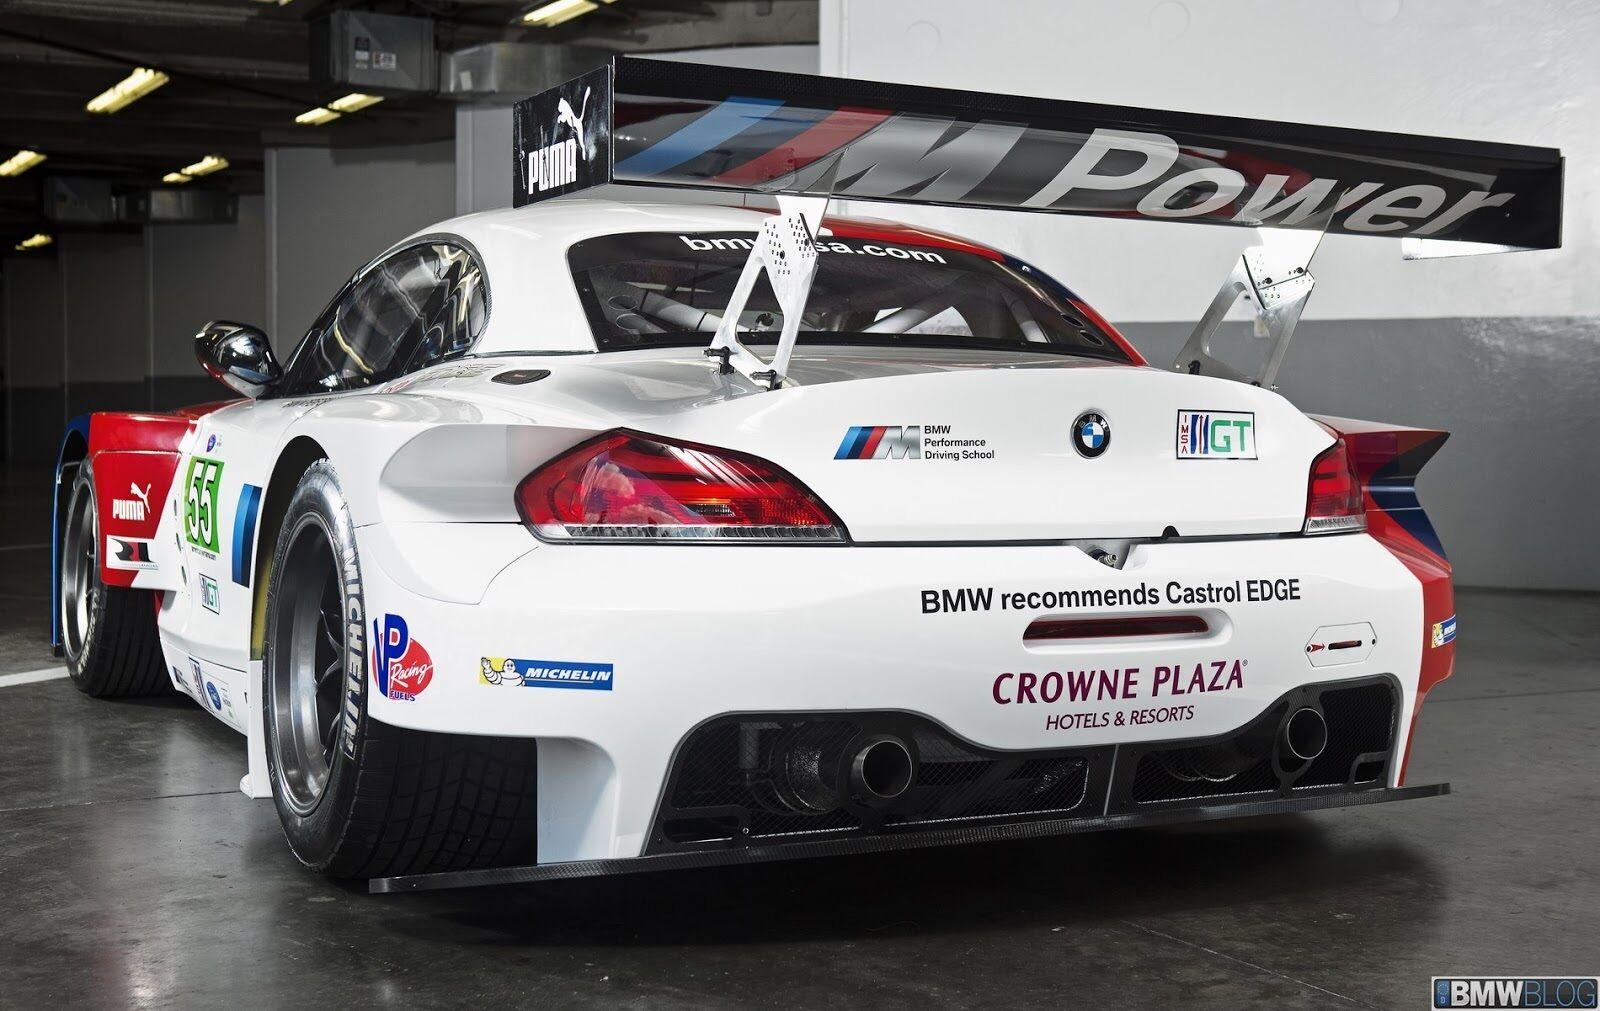 Bavarian Auto, LLC